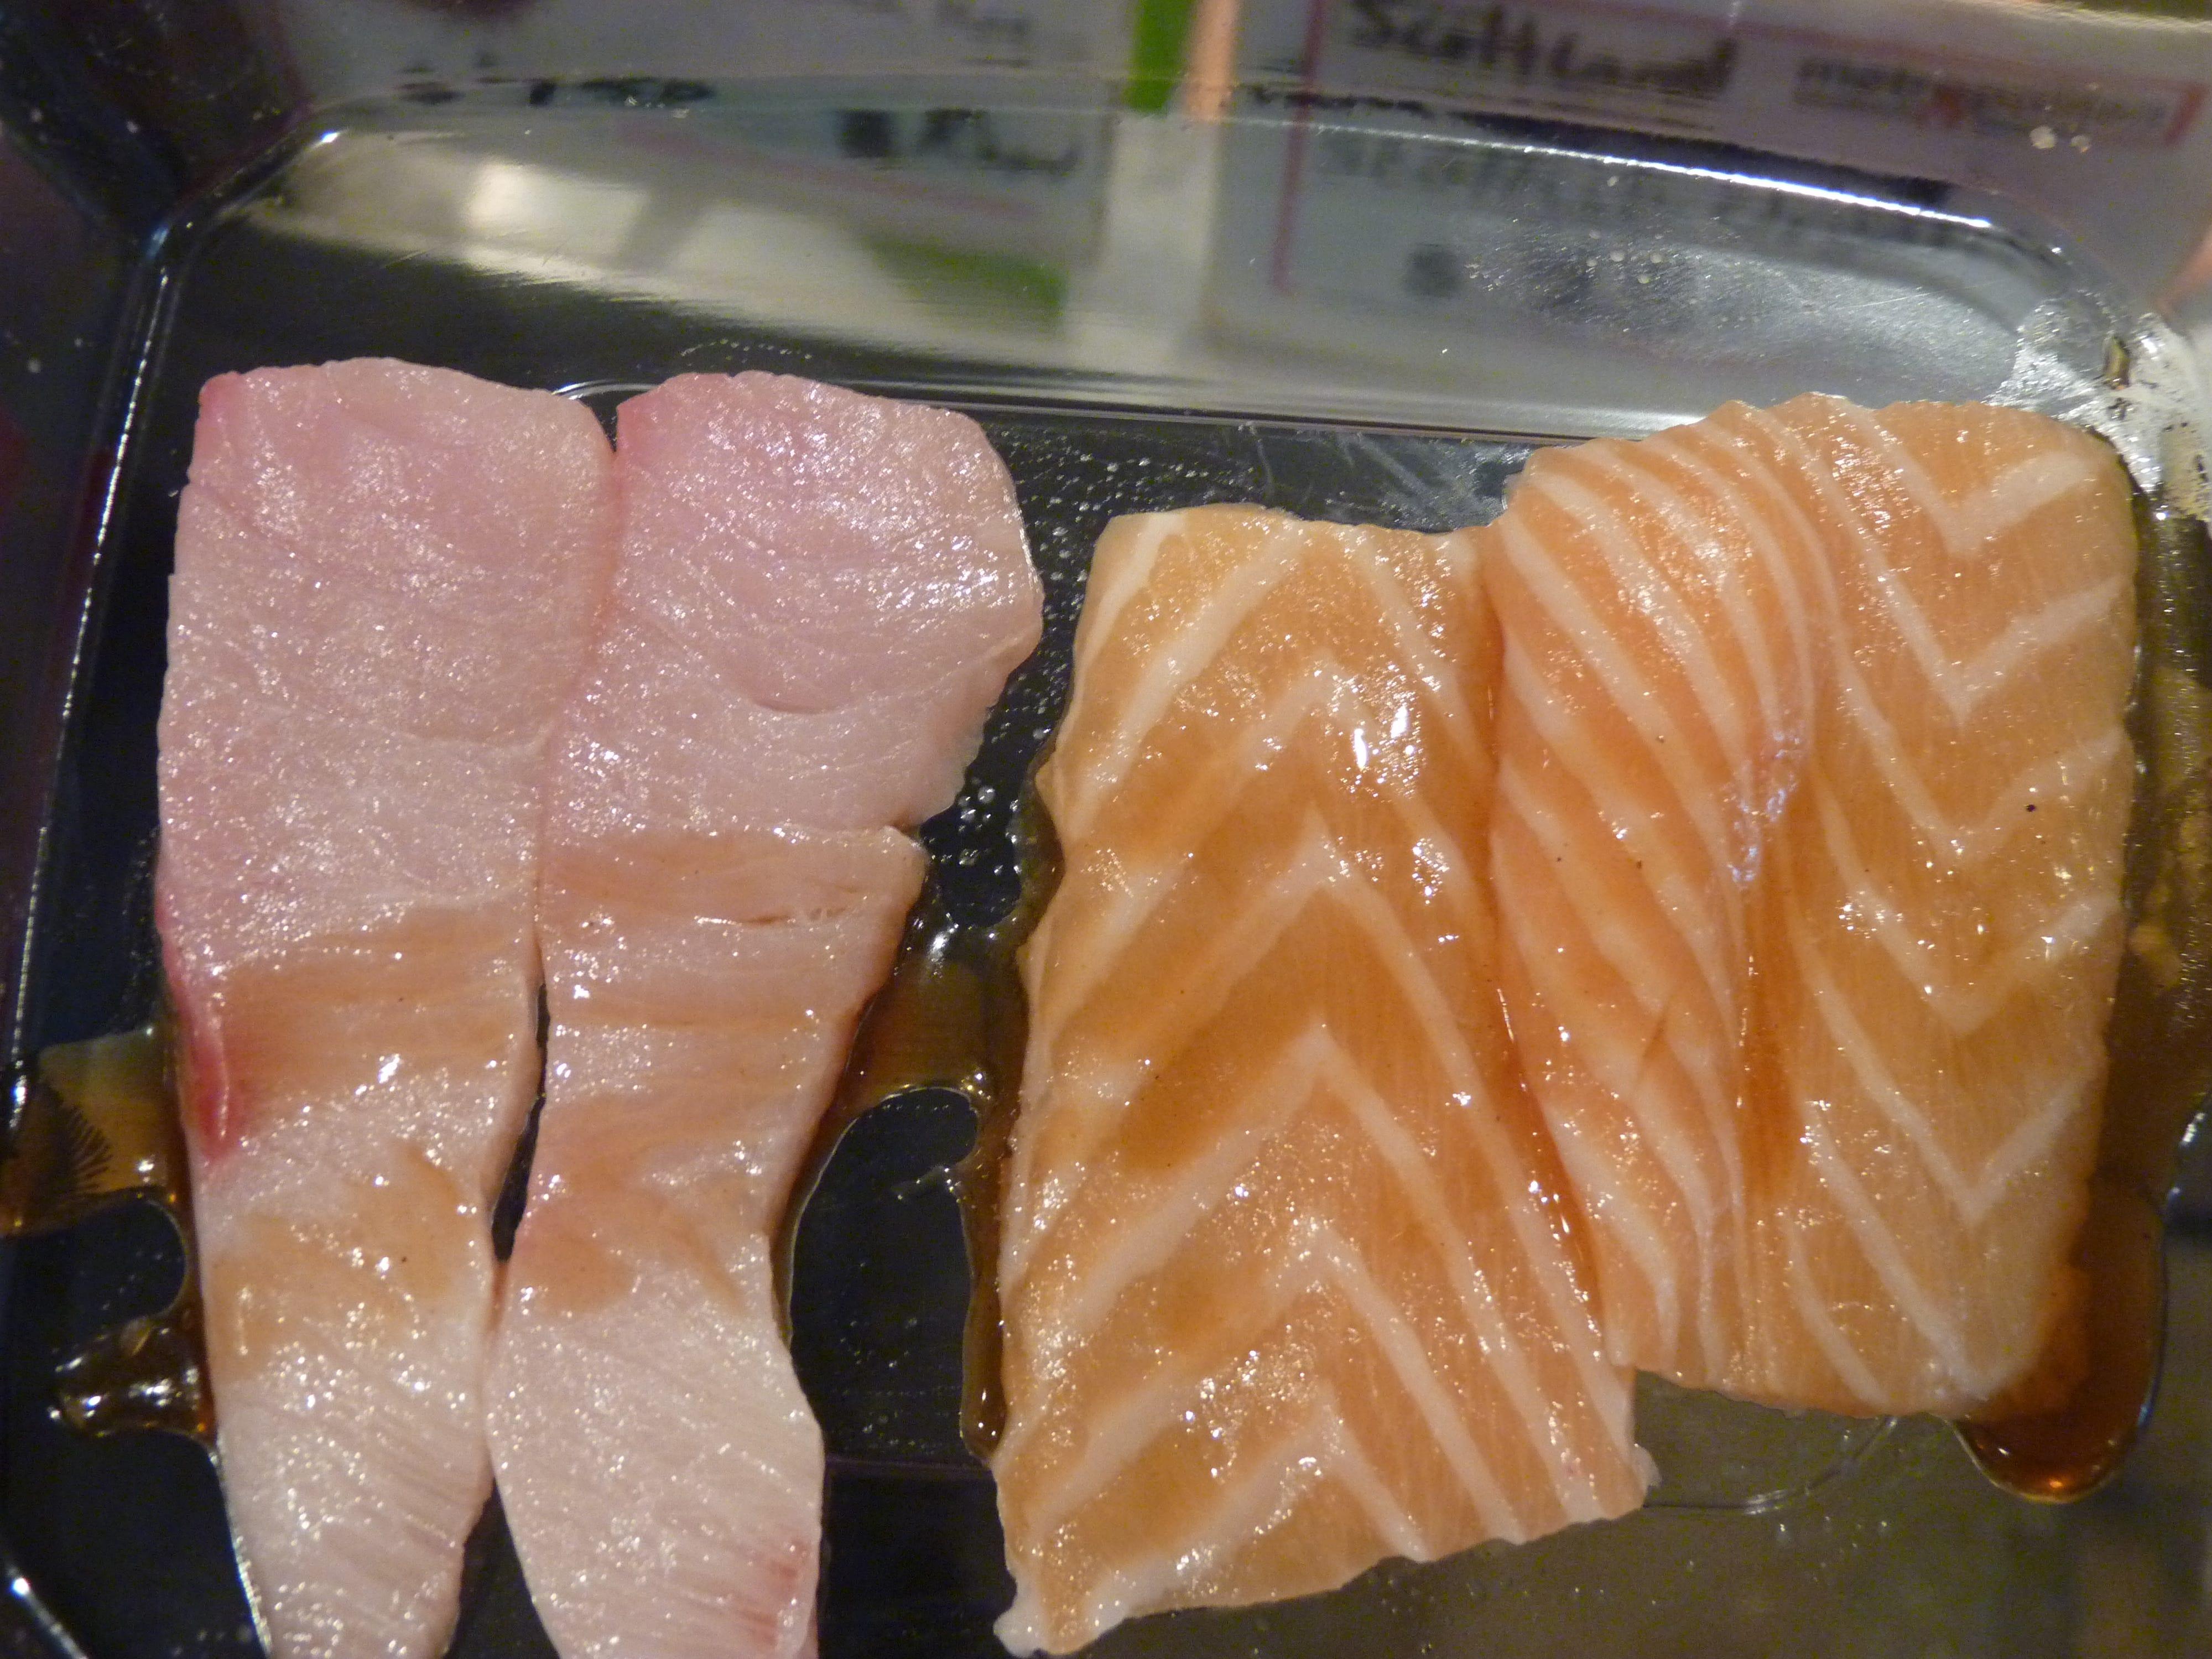 Fresh sashimi at Metropolitan Seafood & Gourmet in Lebanon.